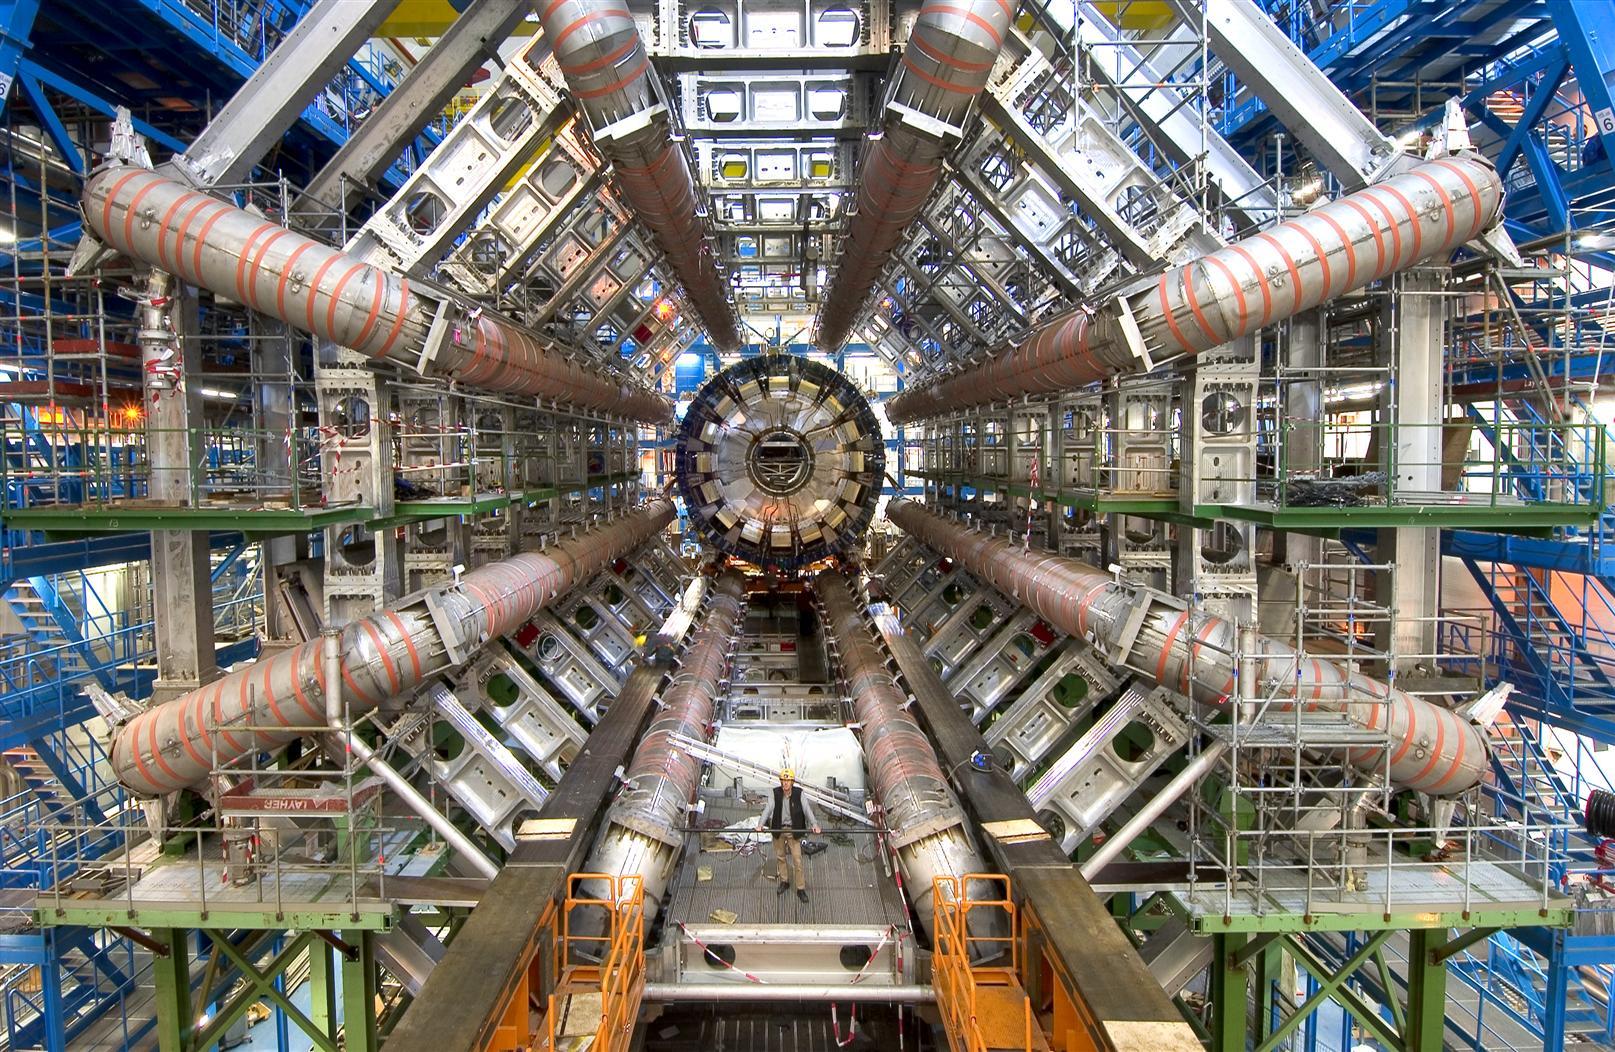 ATLAS experiment at CERN before installing the calorimeter.